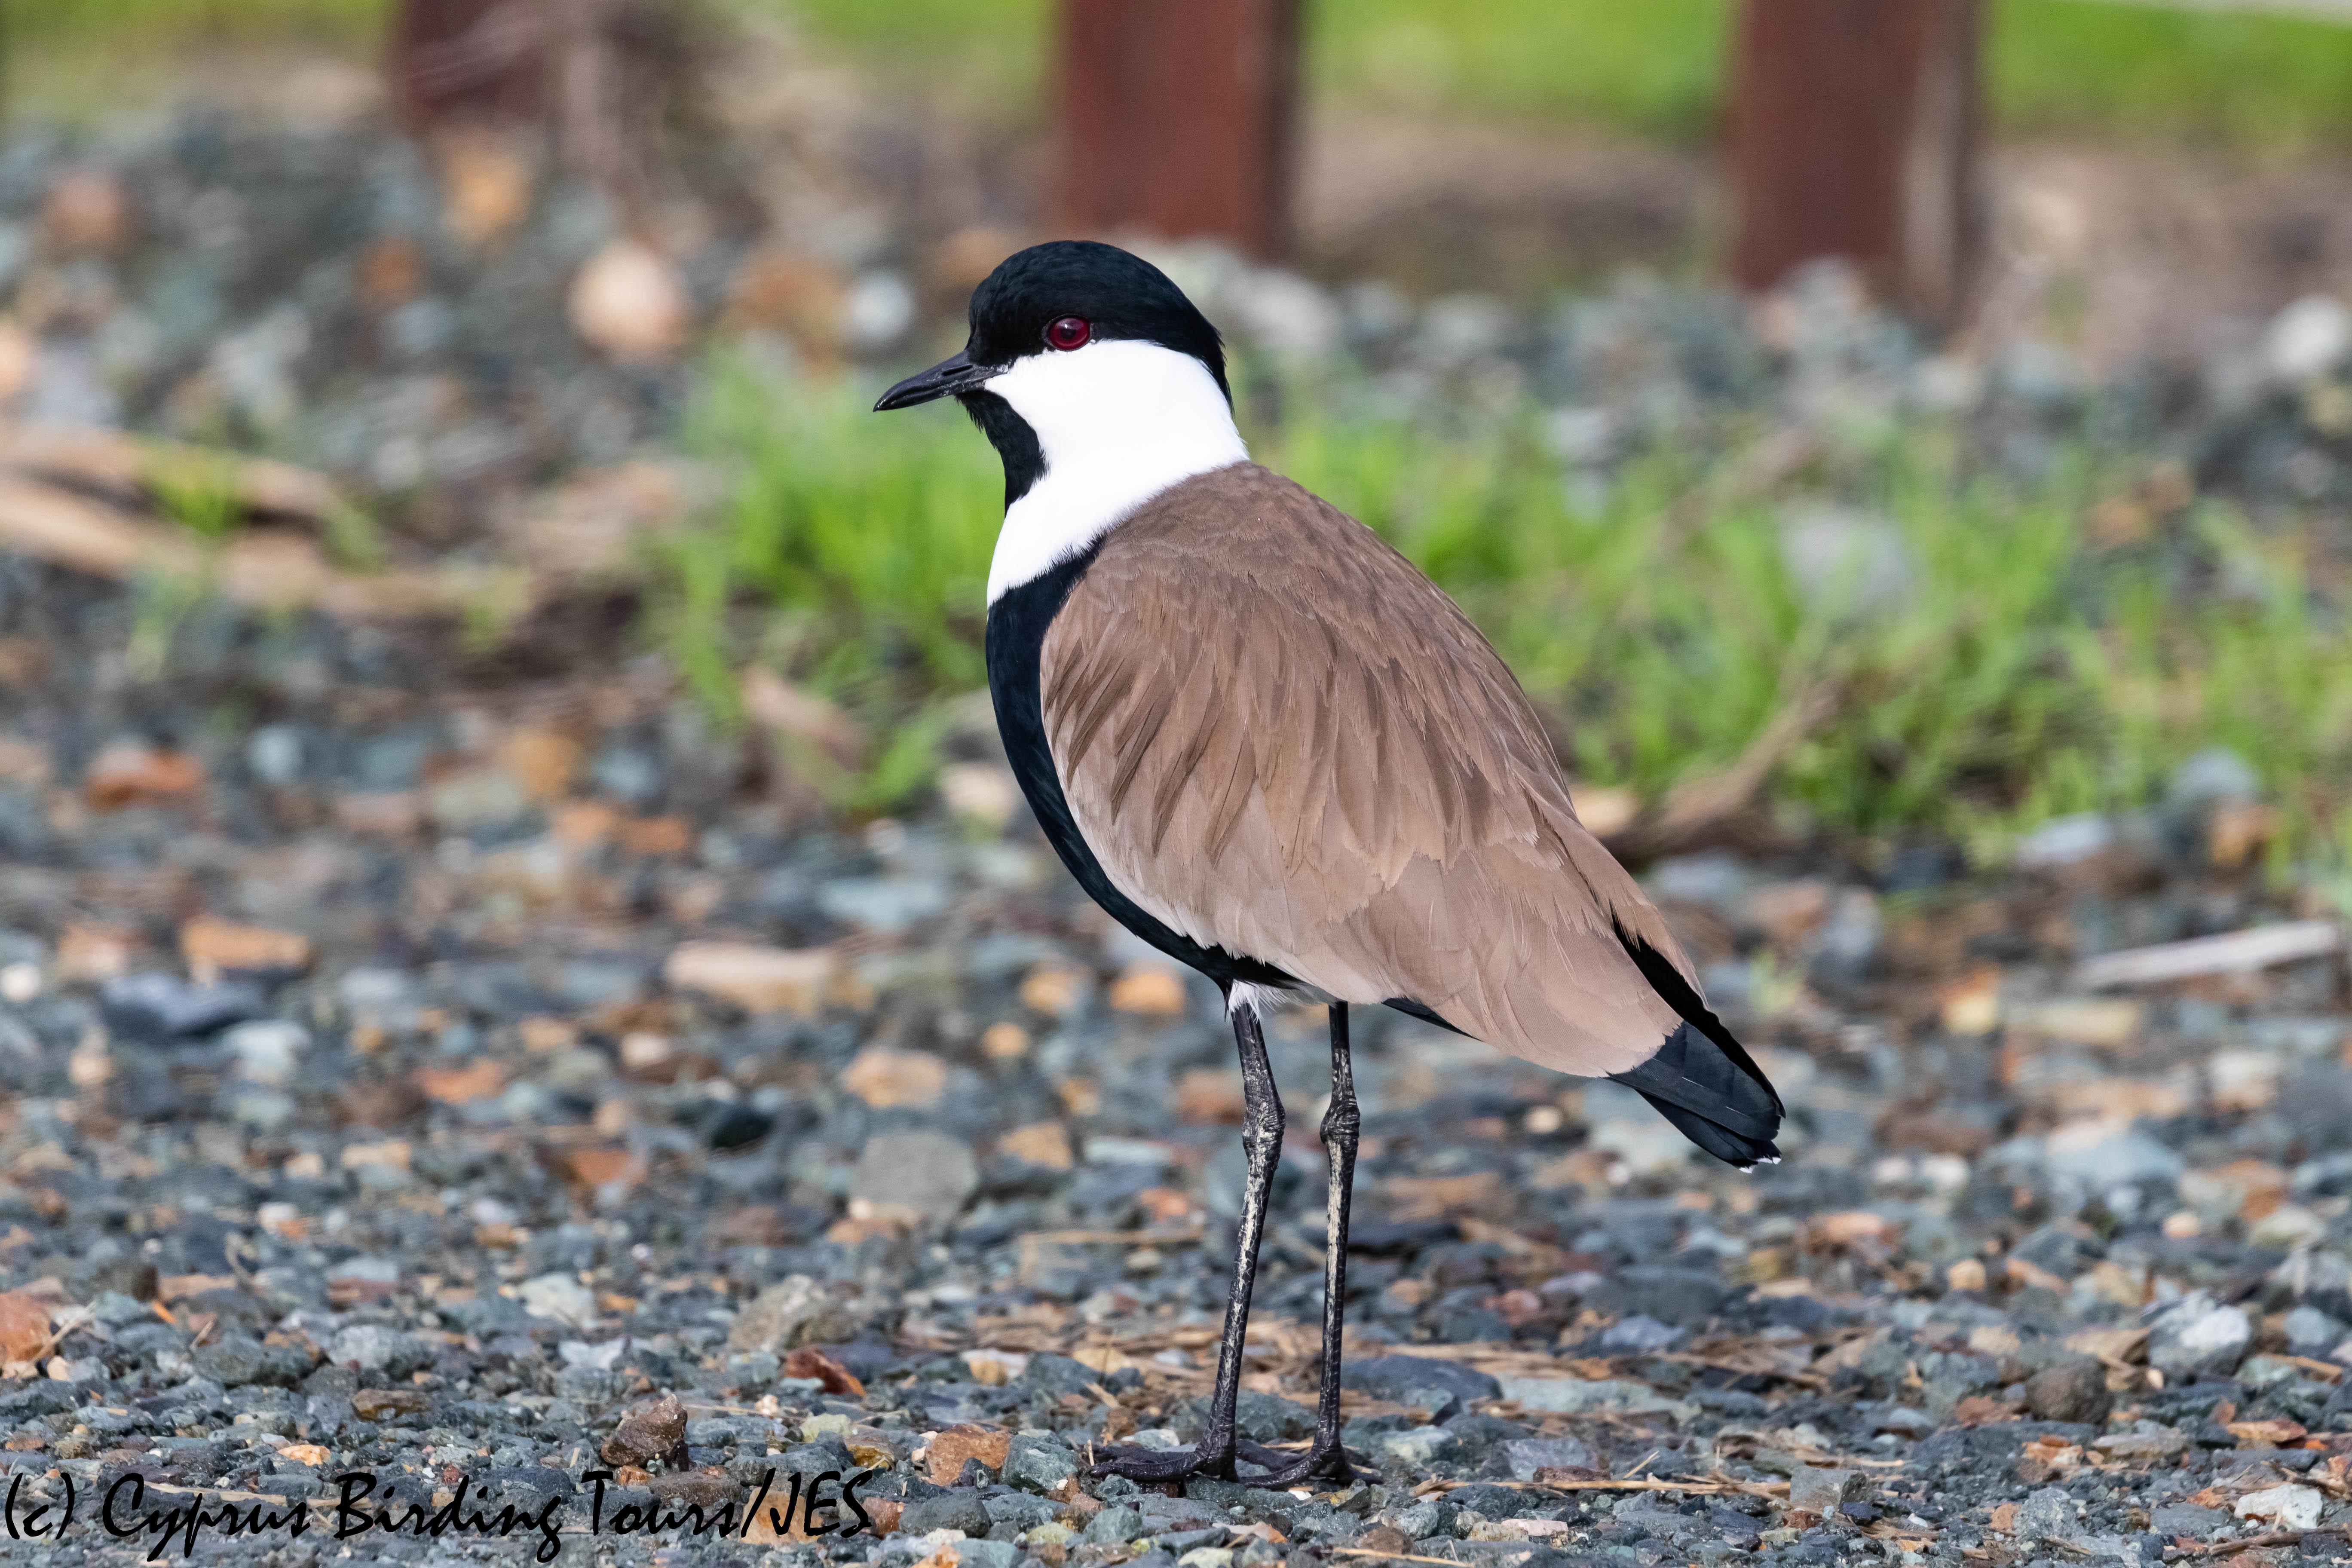 Spur-winged Lapwing, Oroklini Marsh, 5th January 2019 (c) Cyprus Birding Tours